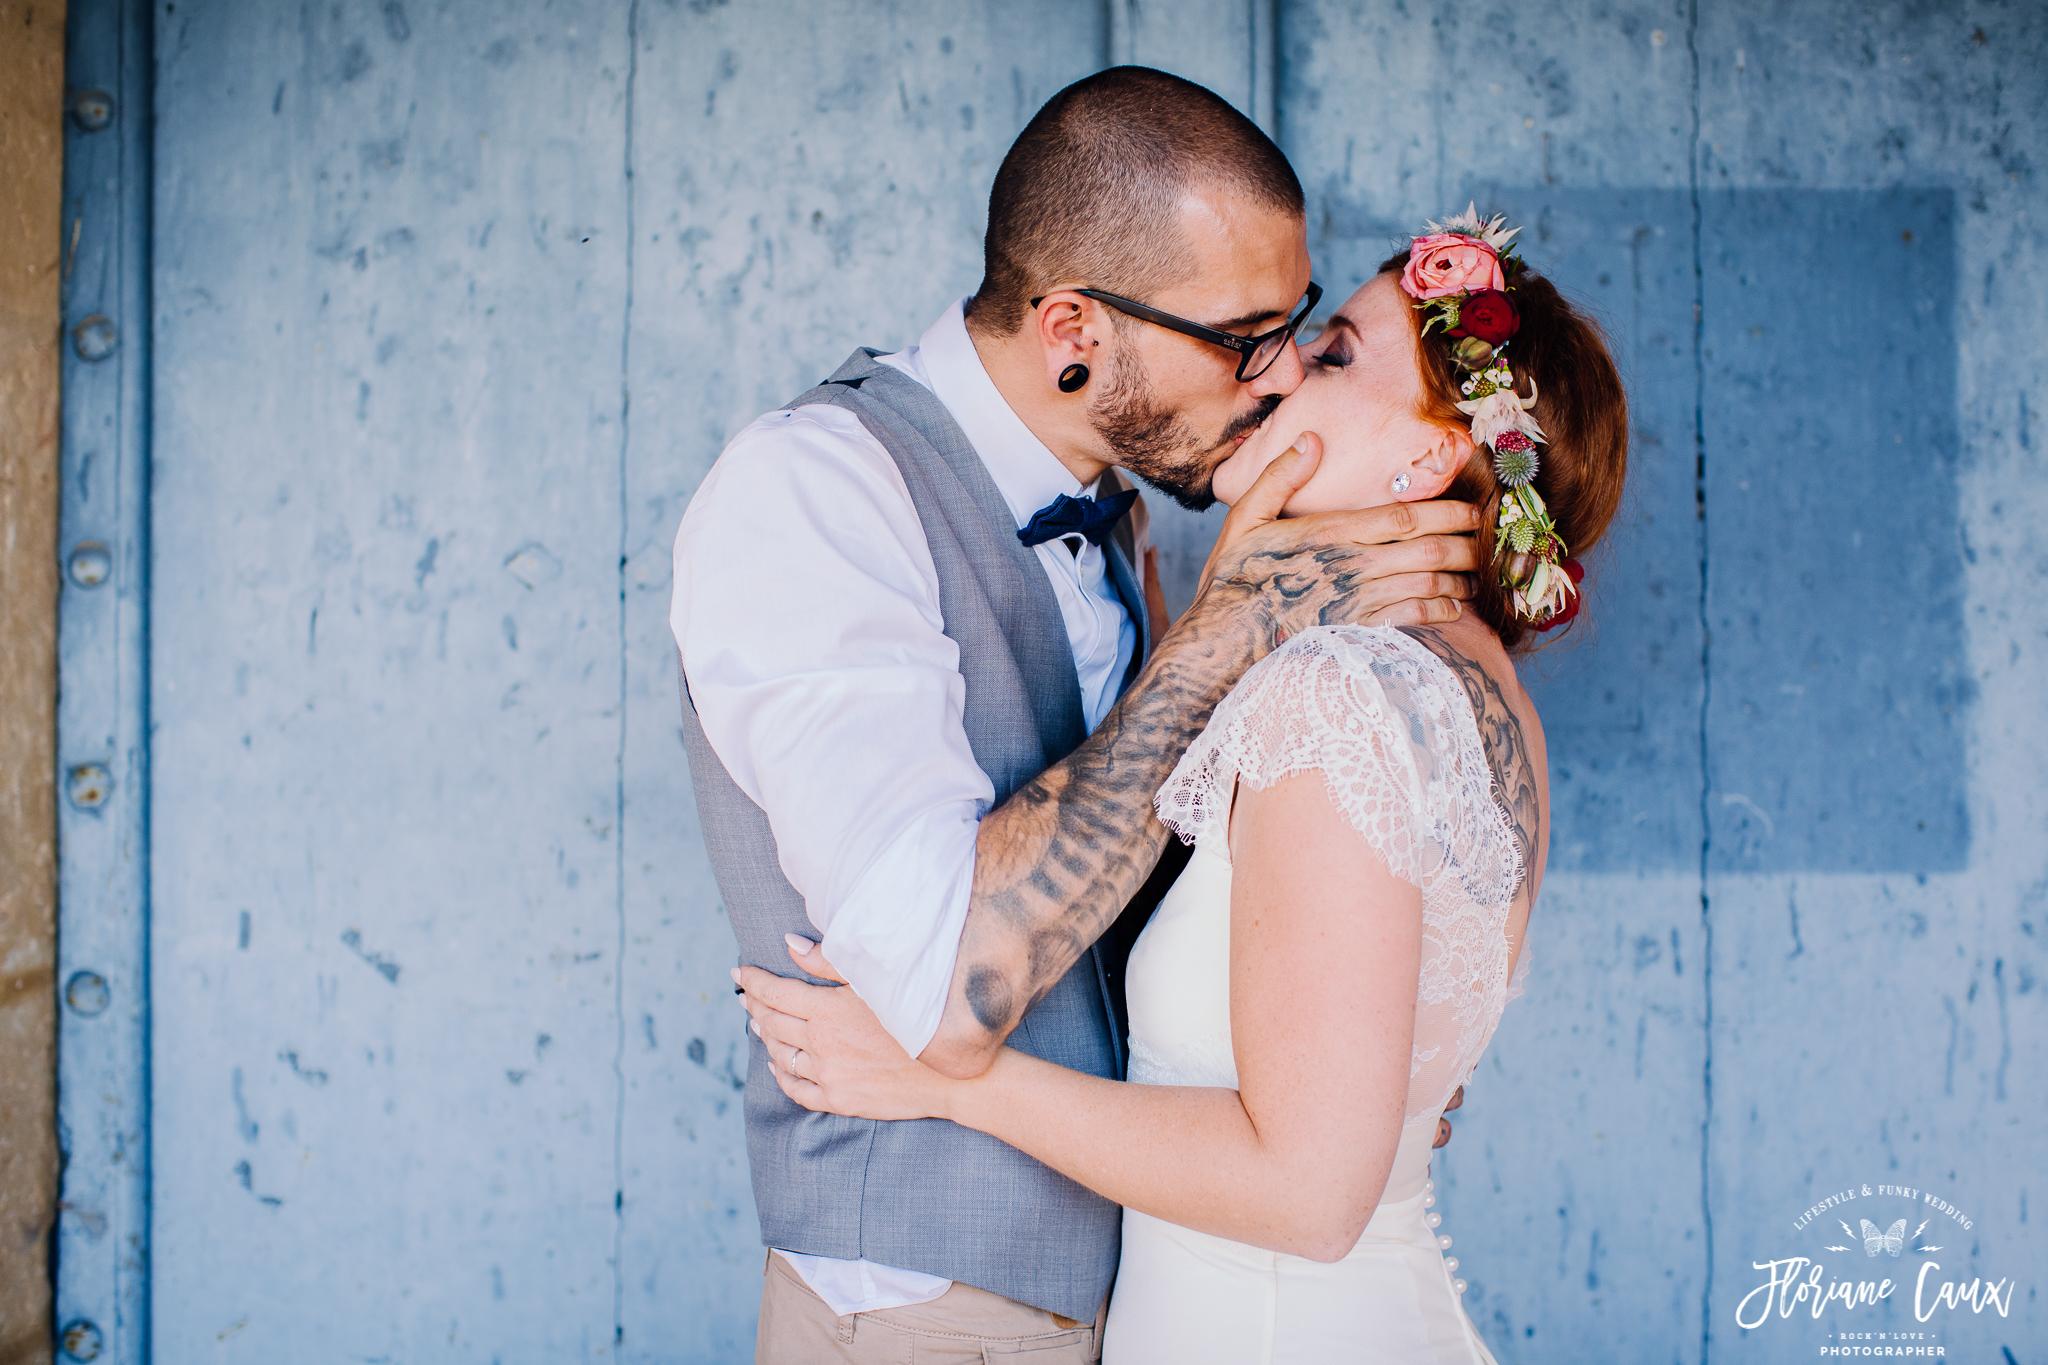 photographe-mariage-toulouse-rocknroll-maries-tatoues-floriane-caux-51